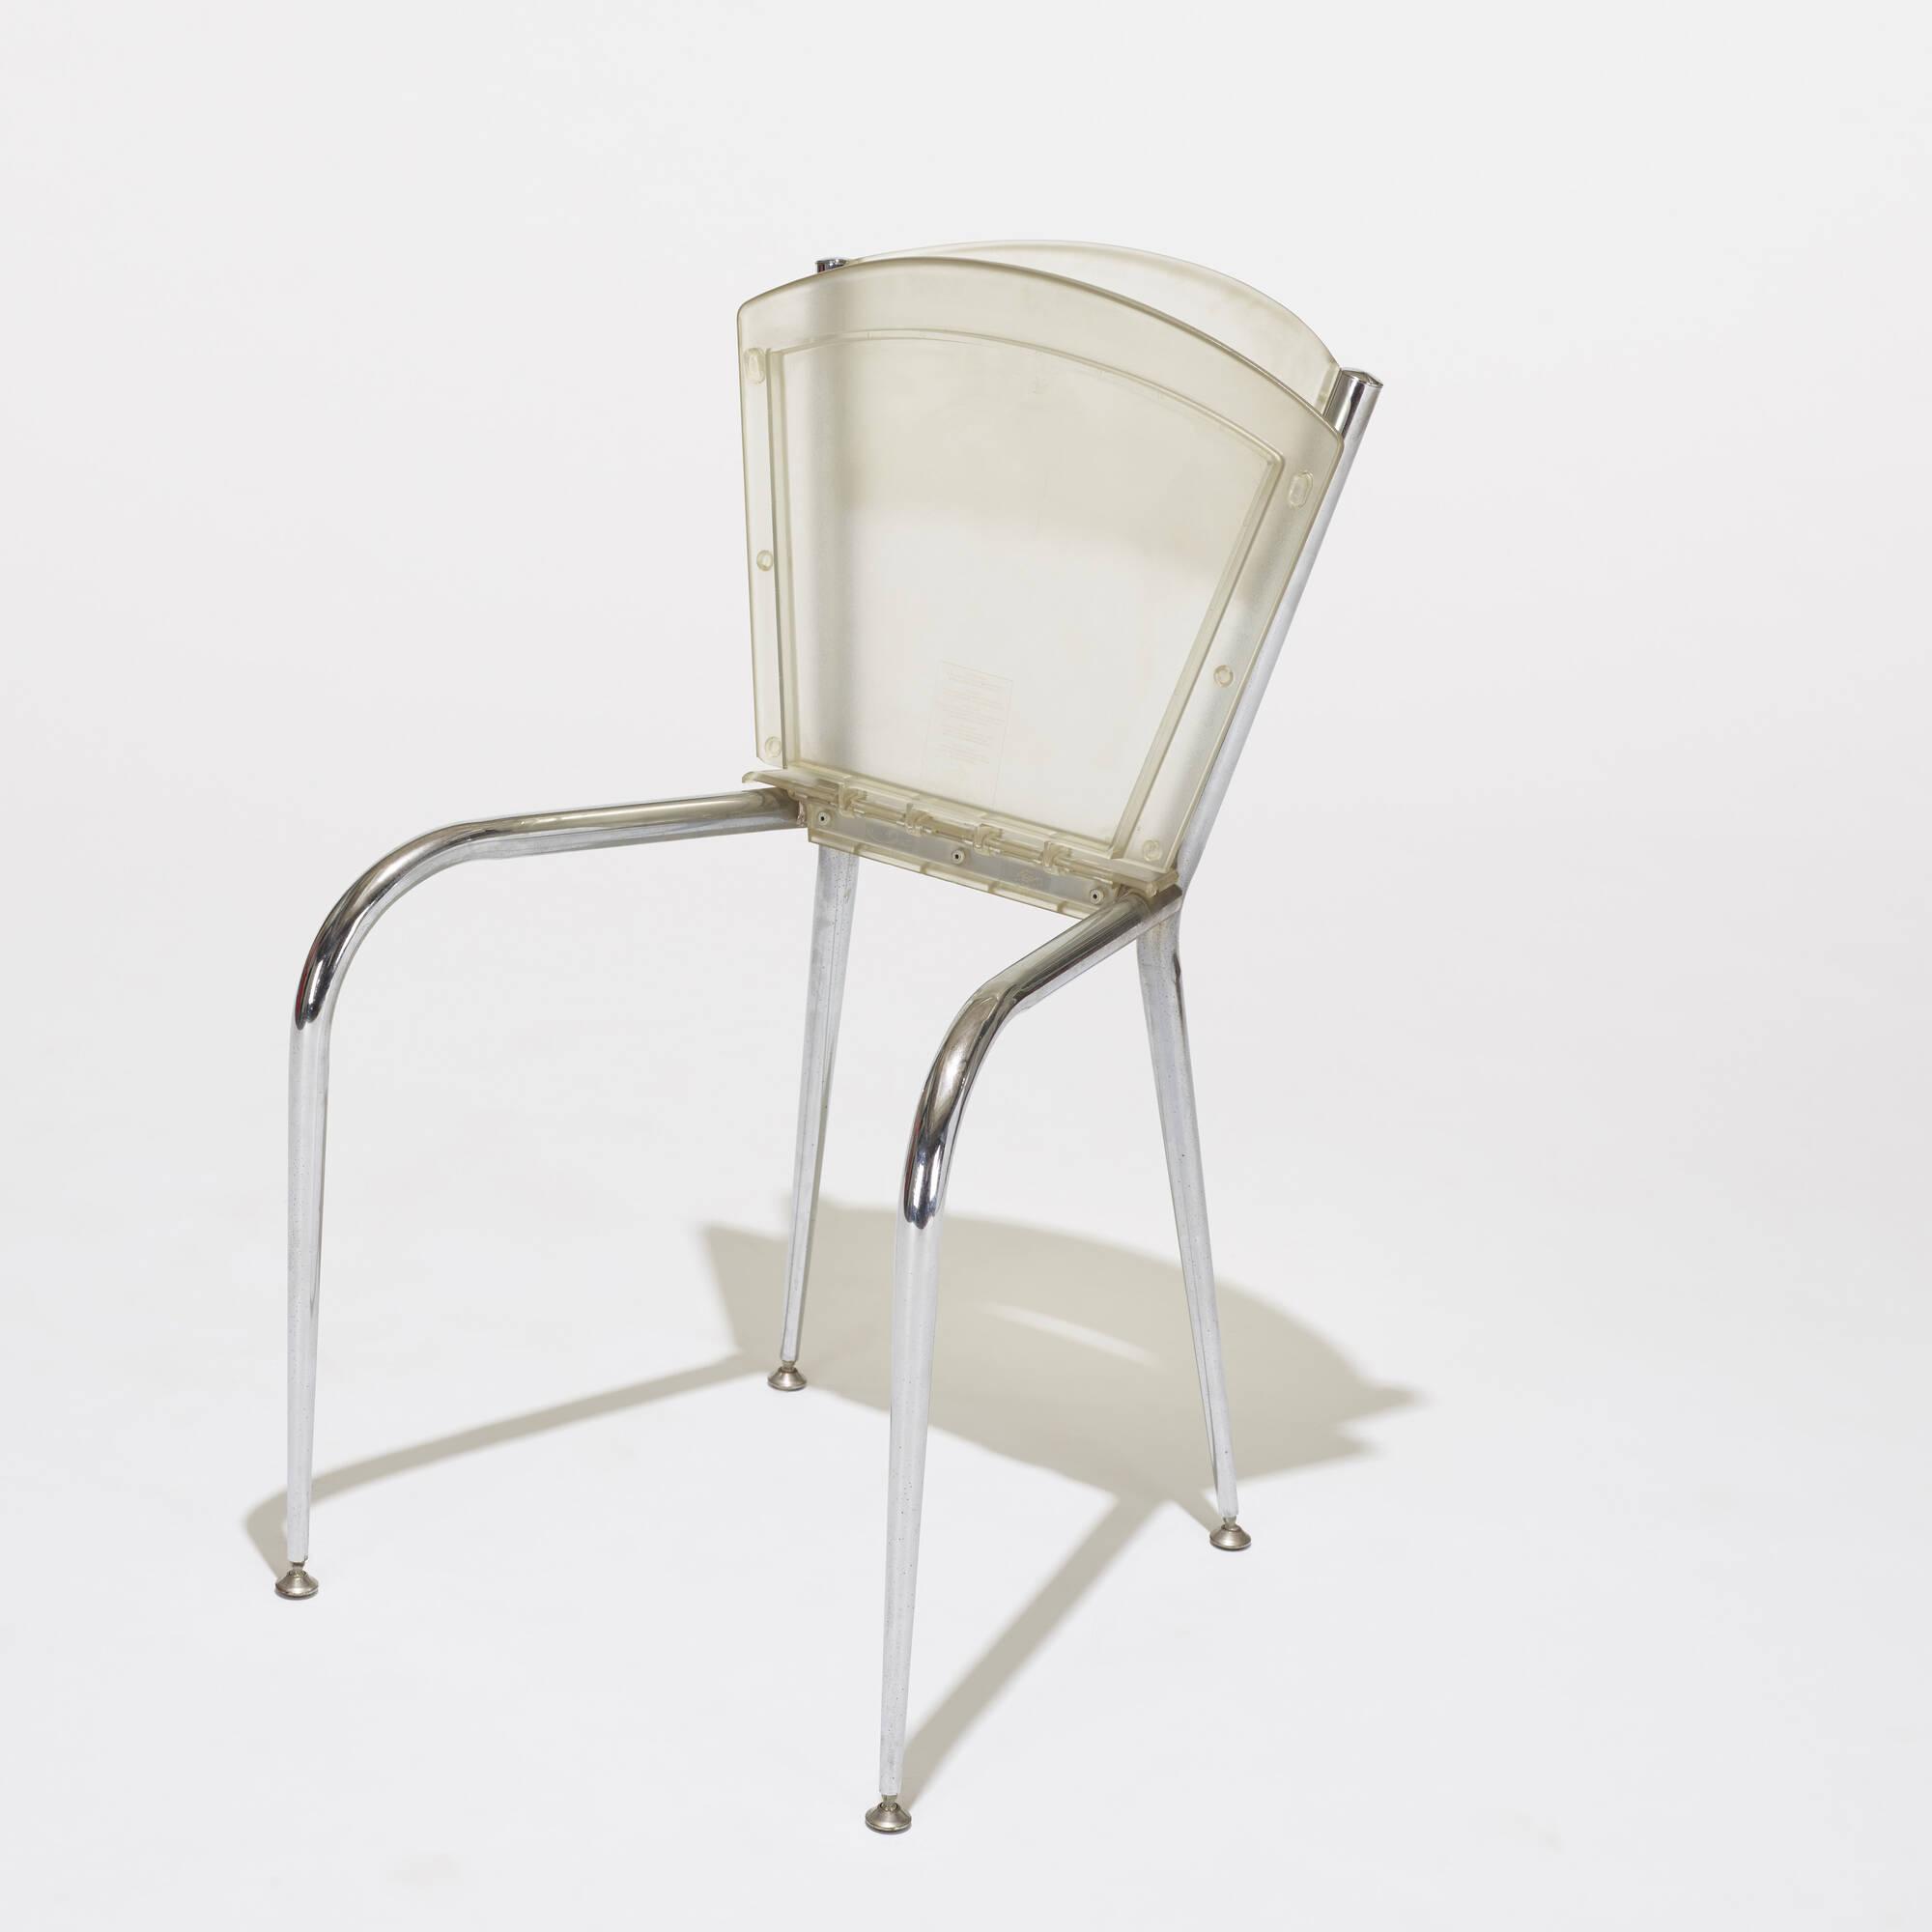 225: Enrico Baleri / Mimì chair (3 of 4)